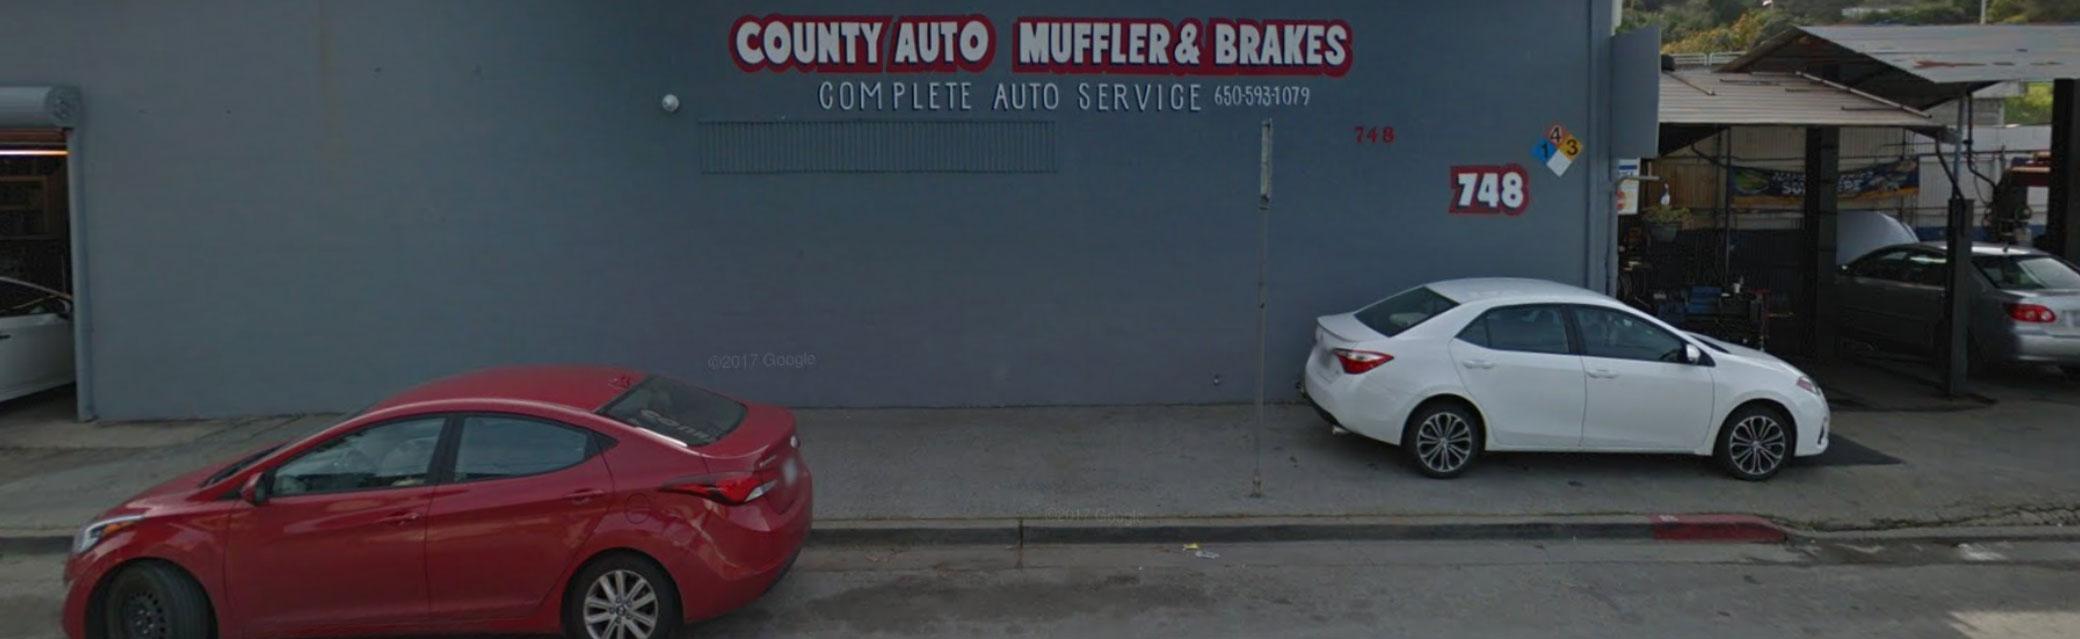 County Auto Muffler & Brakes Catalytic Converter Belmont